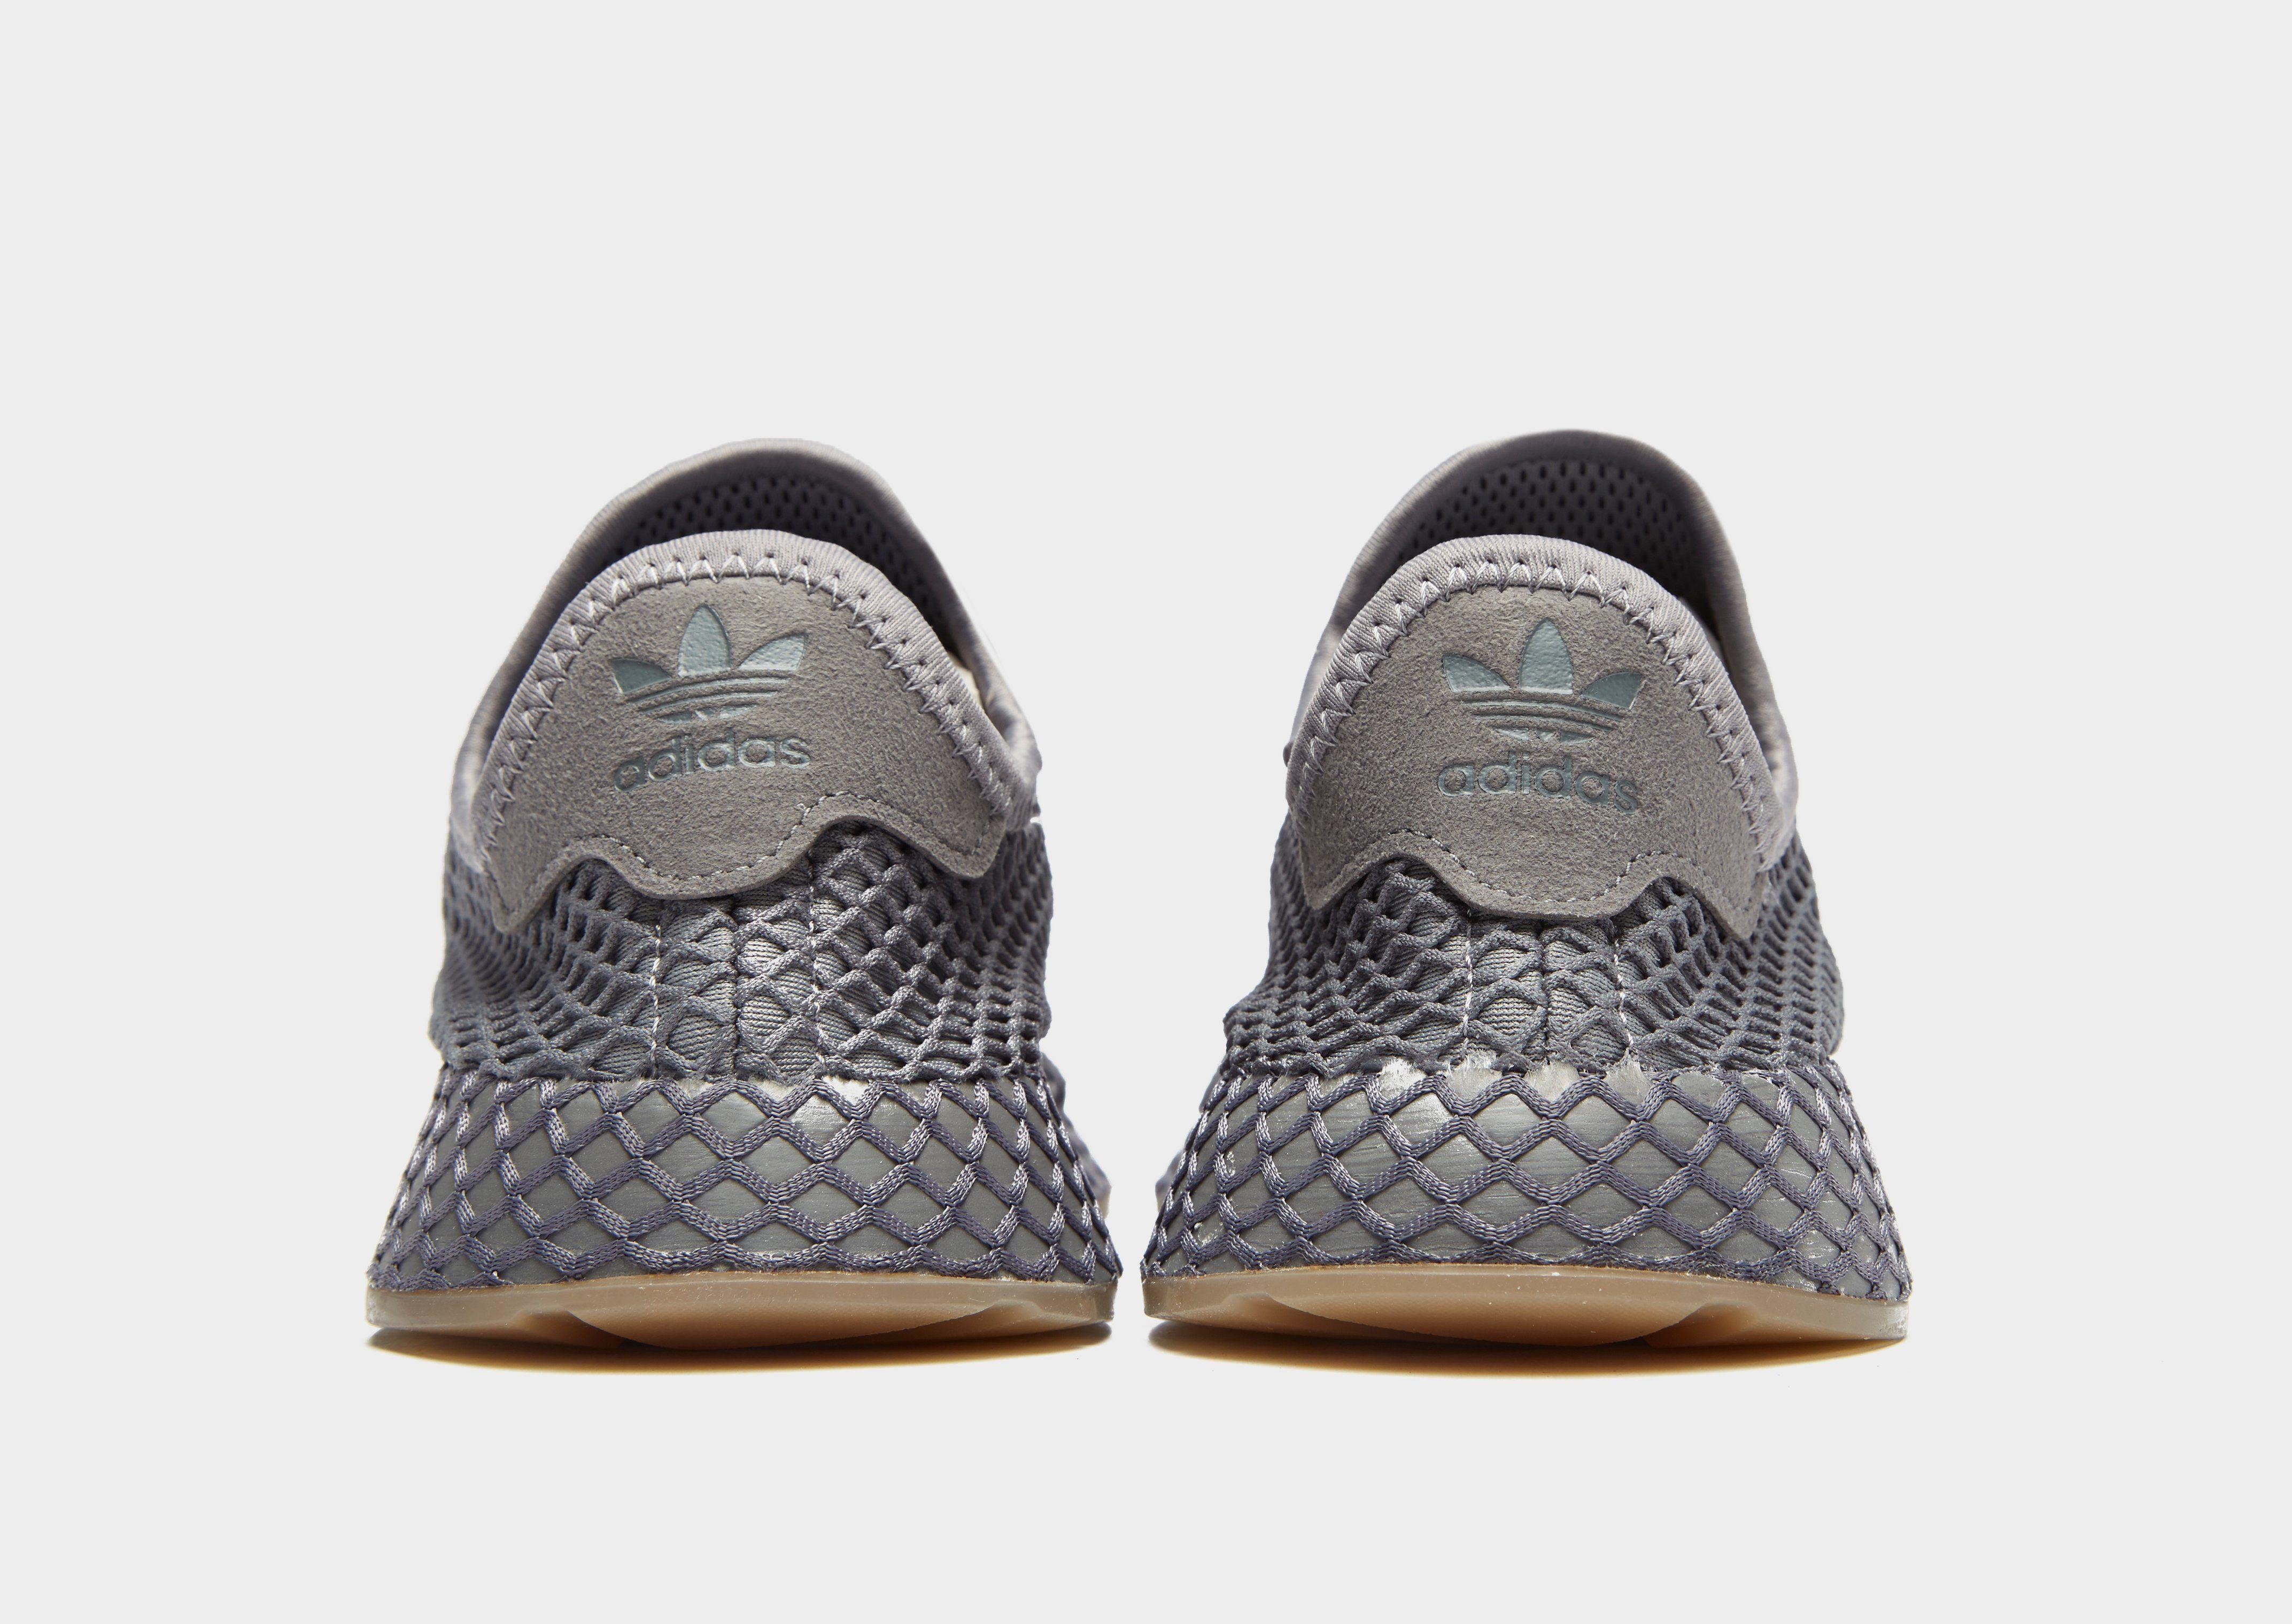 adidas Originals Deerupt Junior Grau Rabatt Günstigsten Preis Outlet Rabatte XqpHk2E